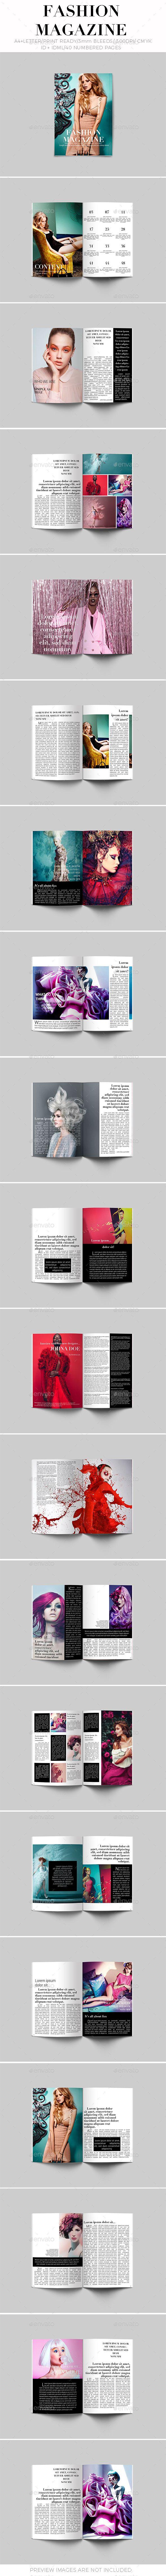 Fashion Magazine Template Pinterest Template Print Templates